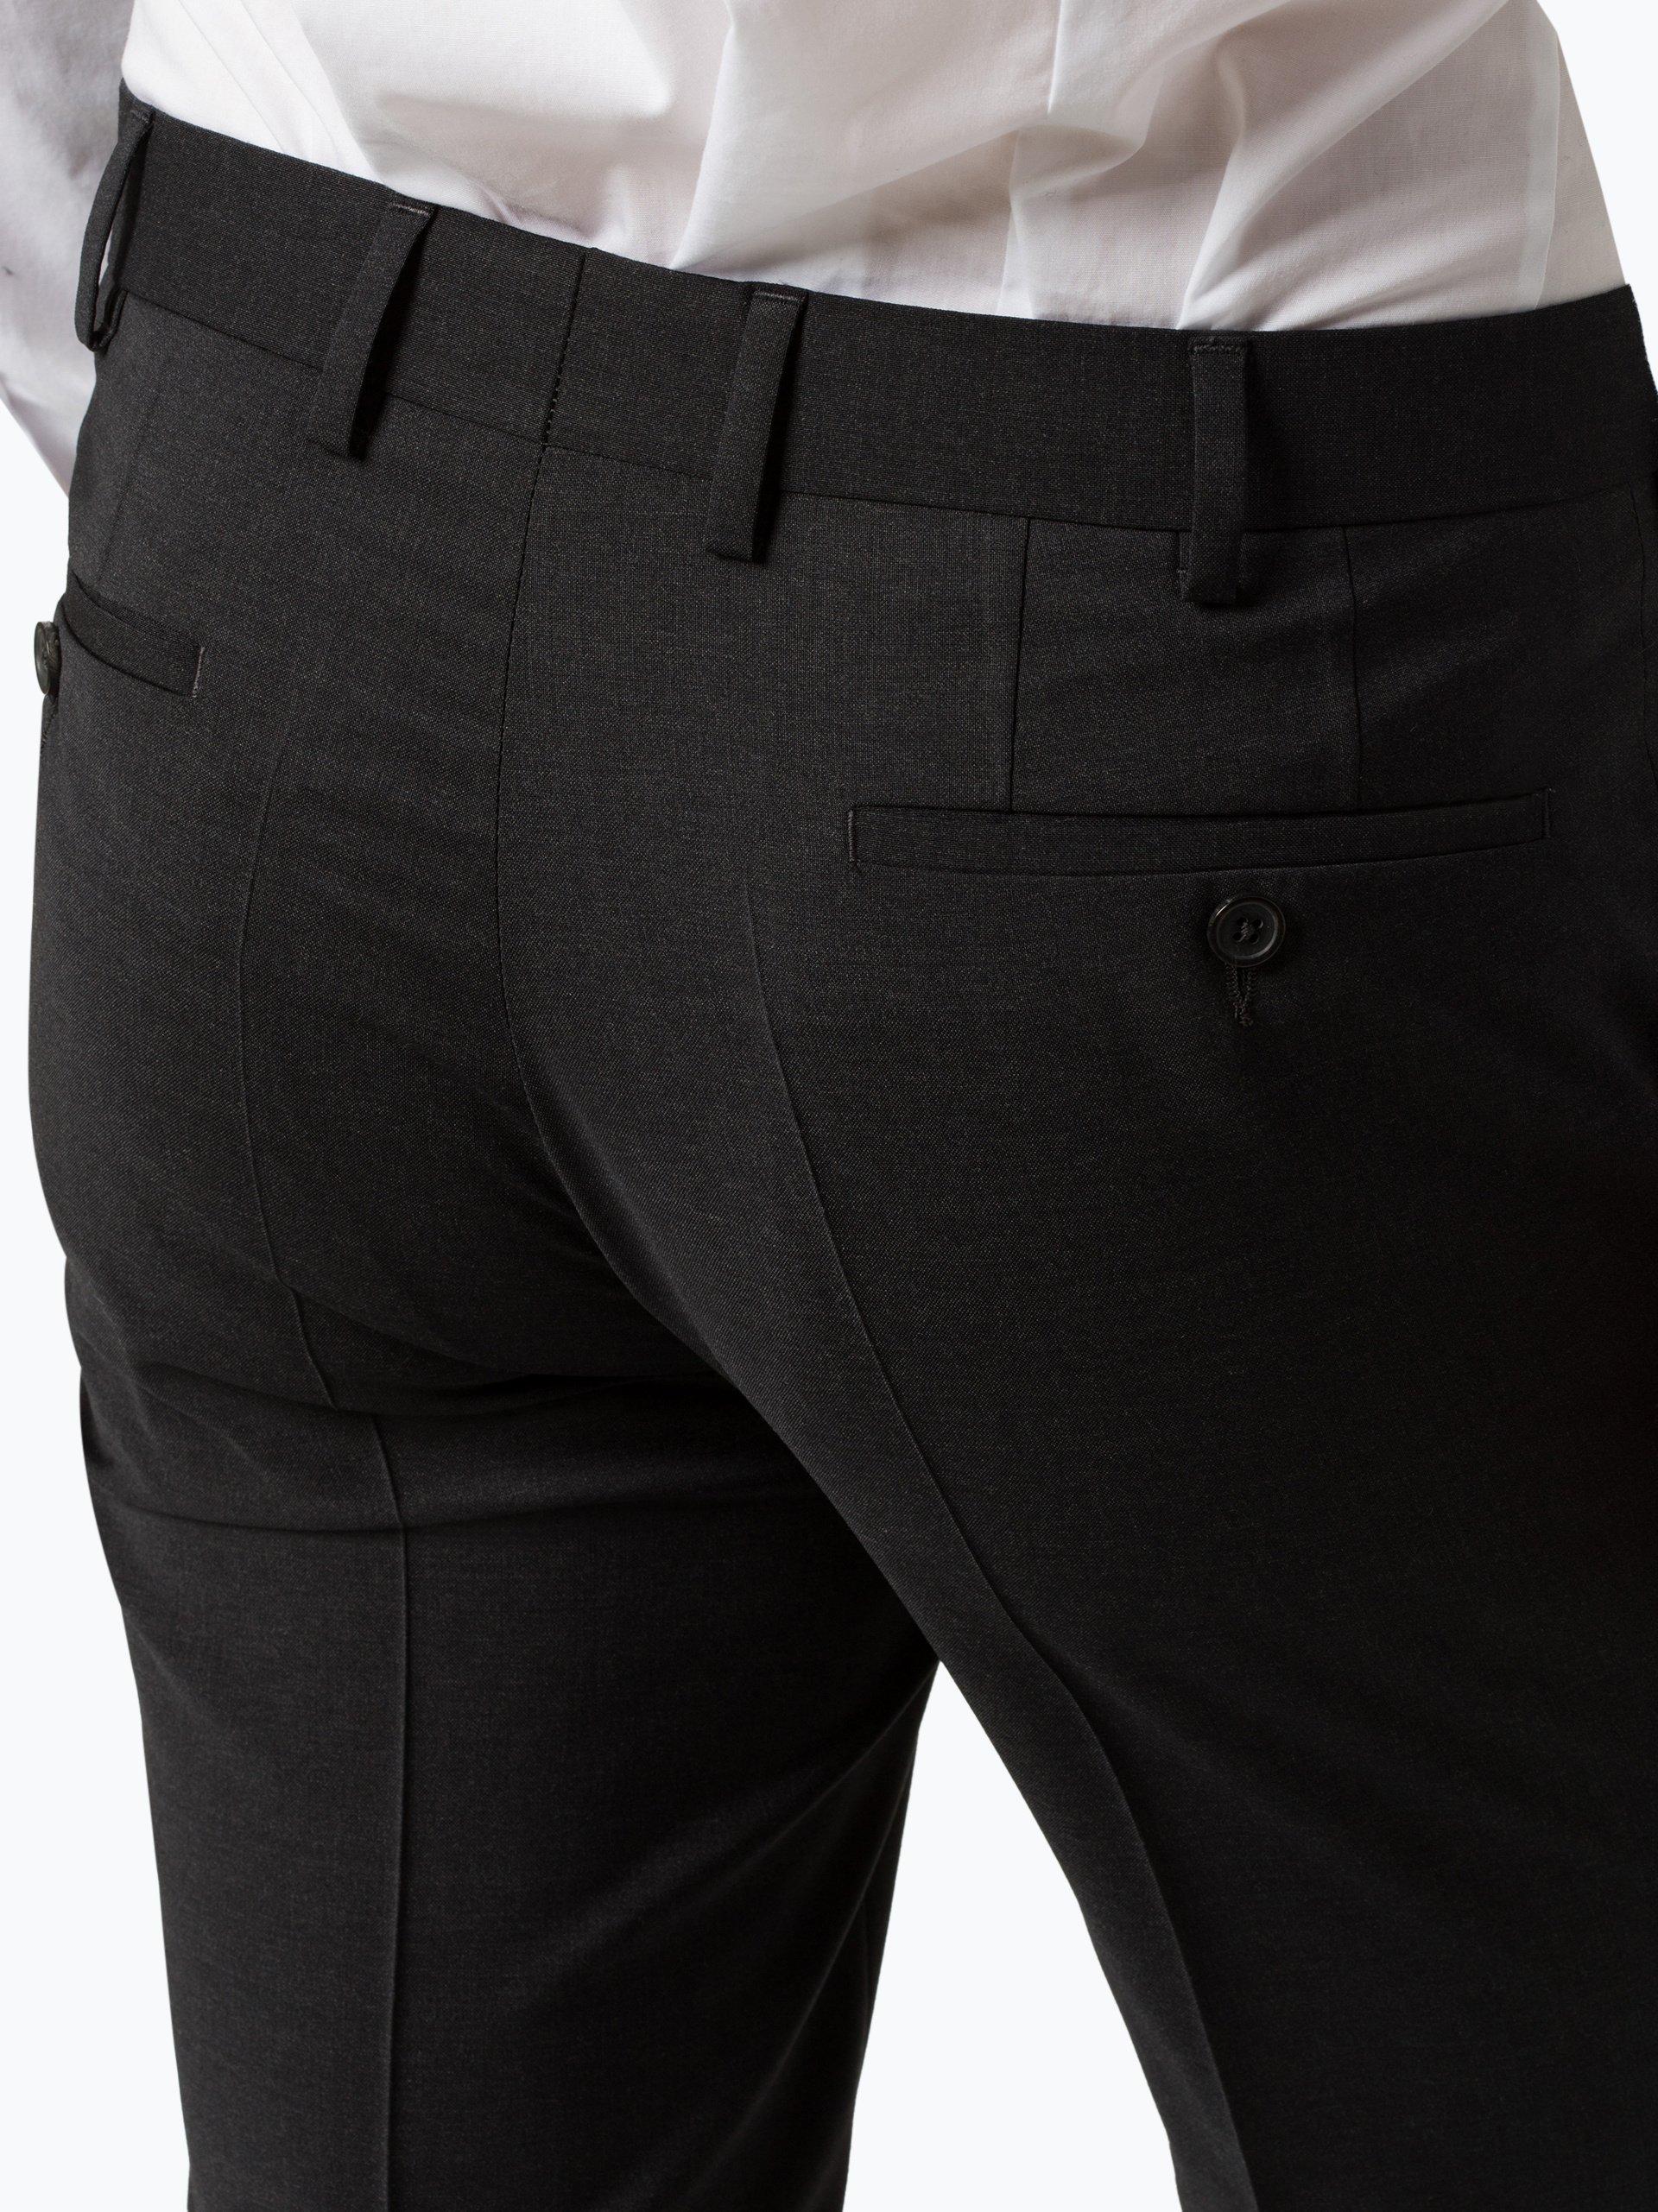 Dressler Spodnie męskie – Sirius